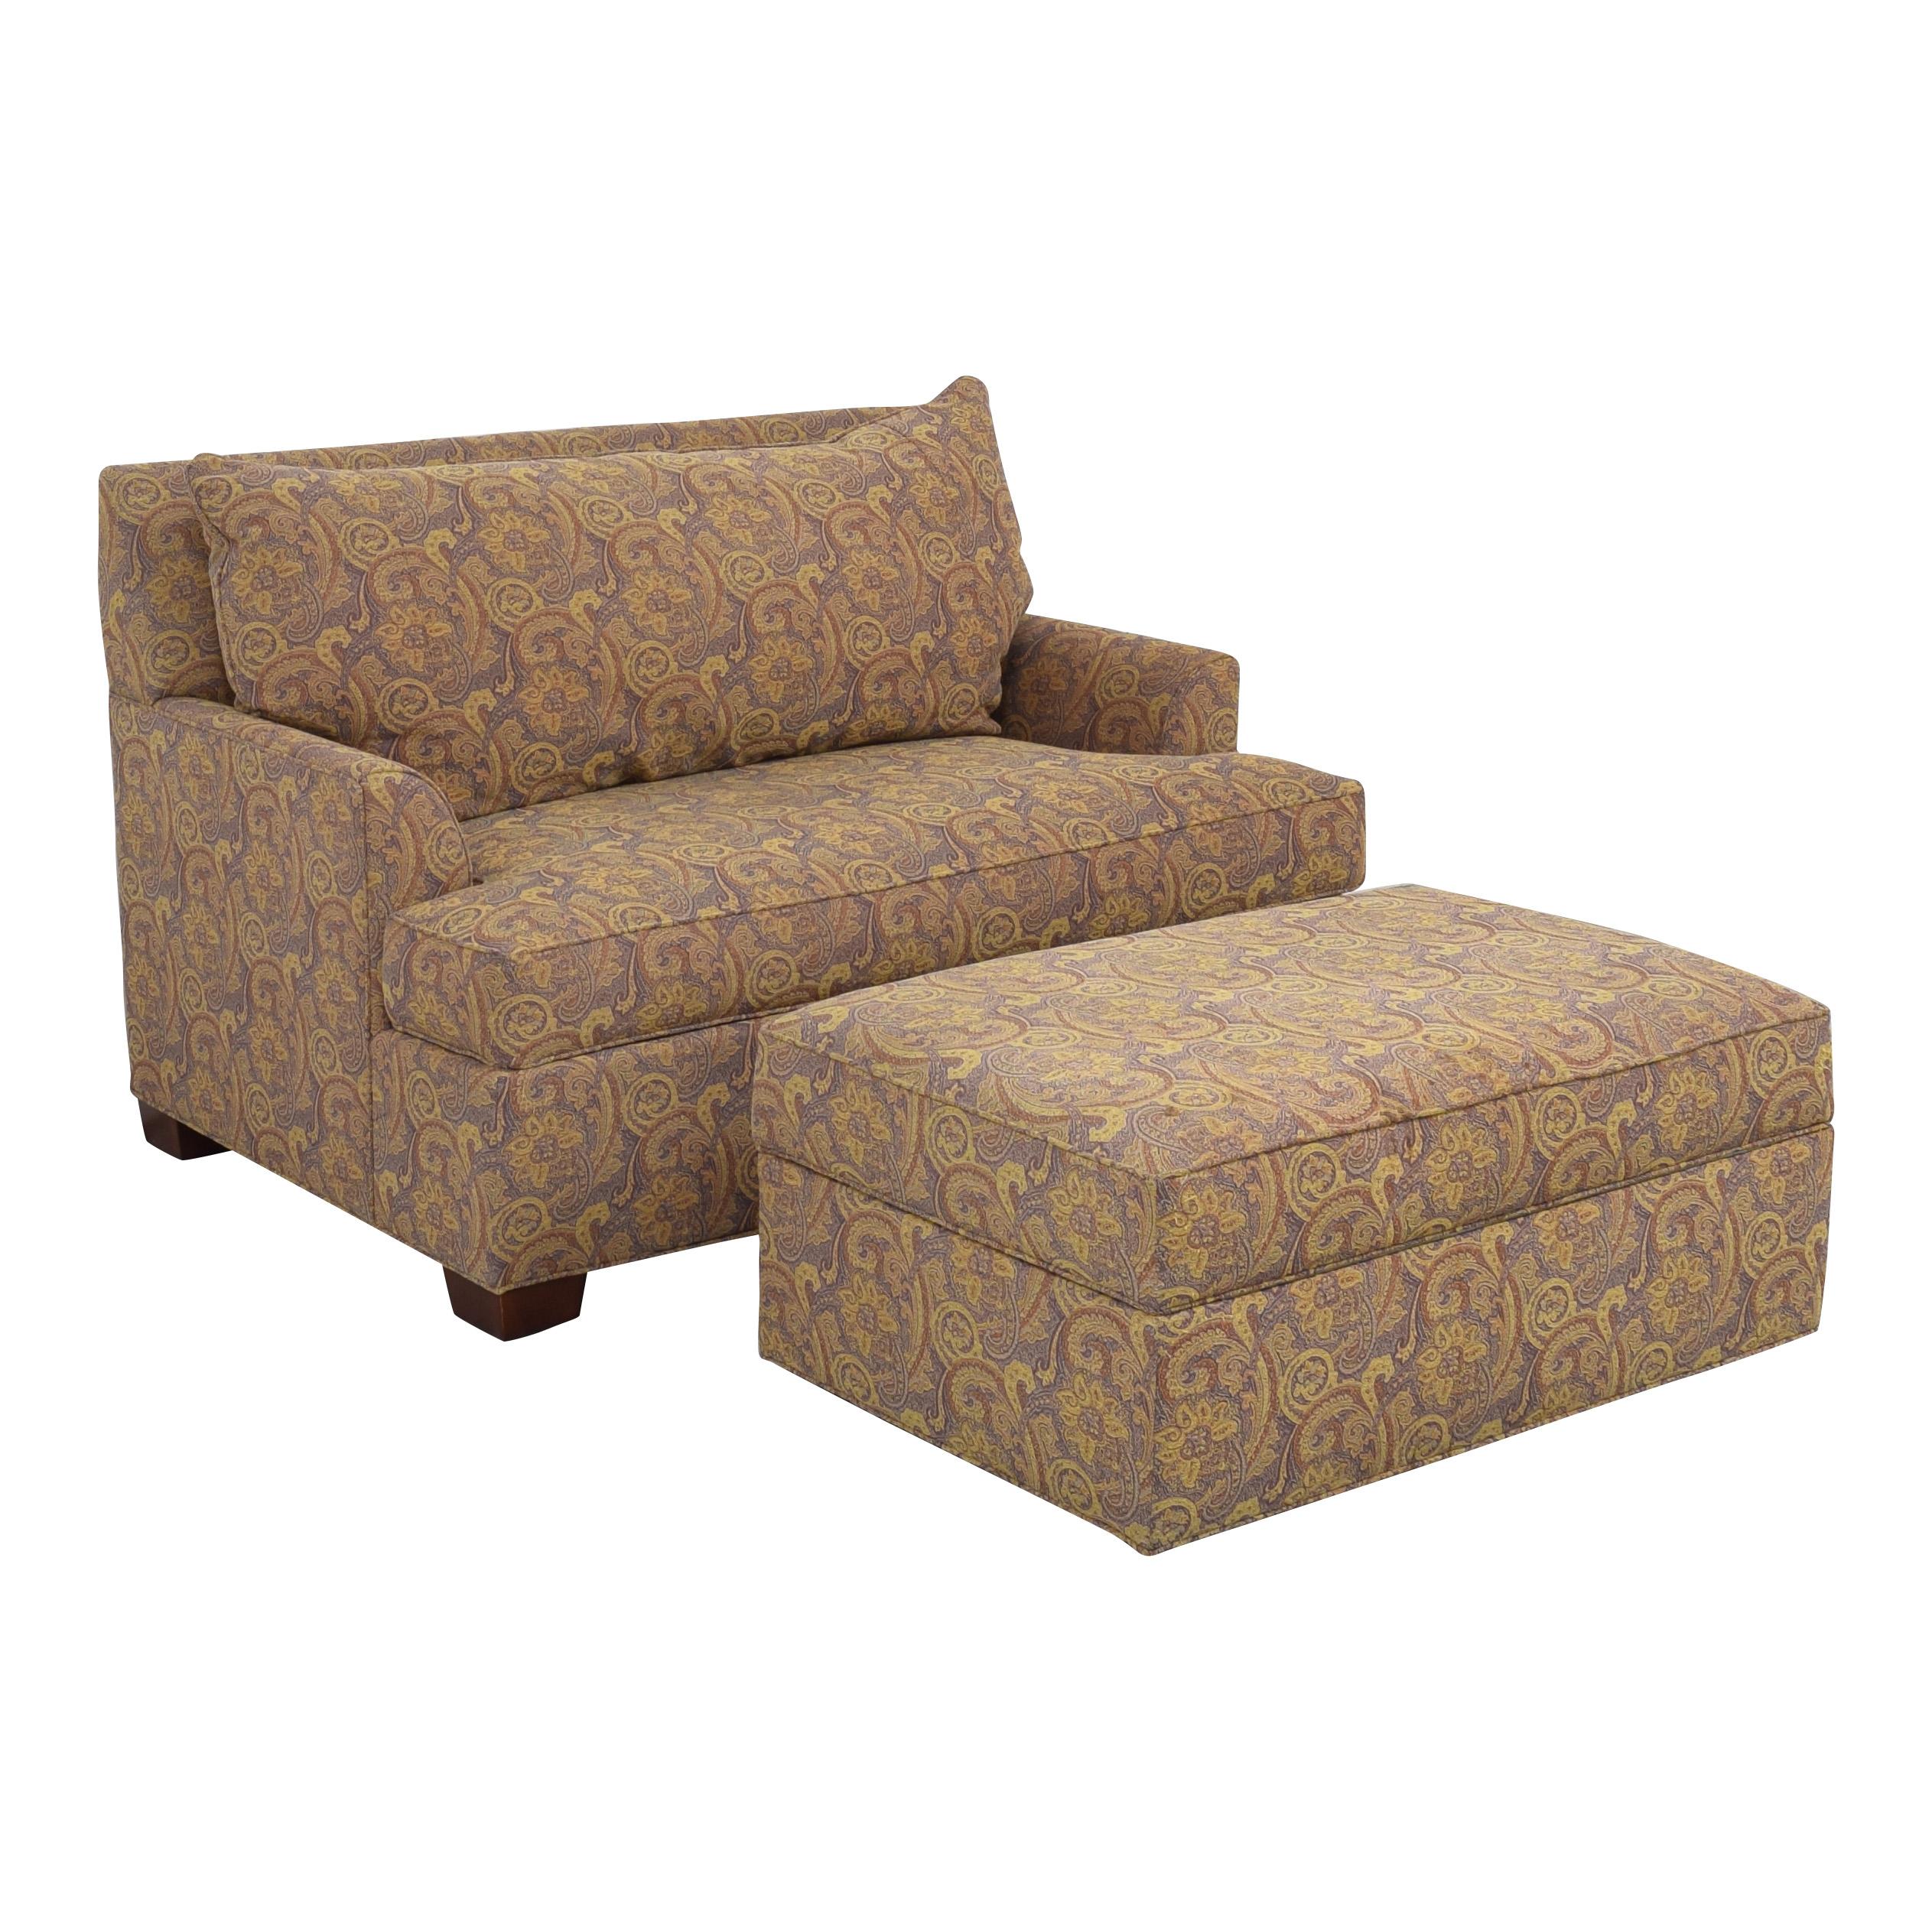 shop Ethan Allen Ethan Allen Marina Chair and a Half Twin Sleeper with Ottoman online